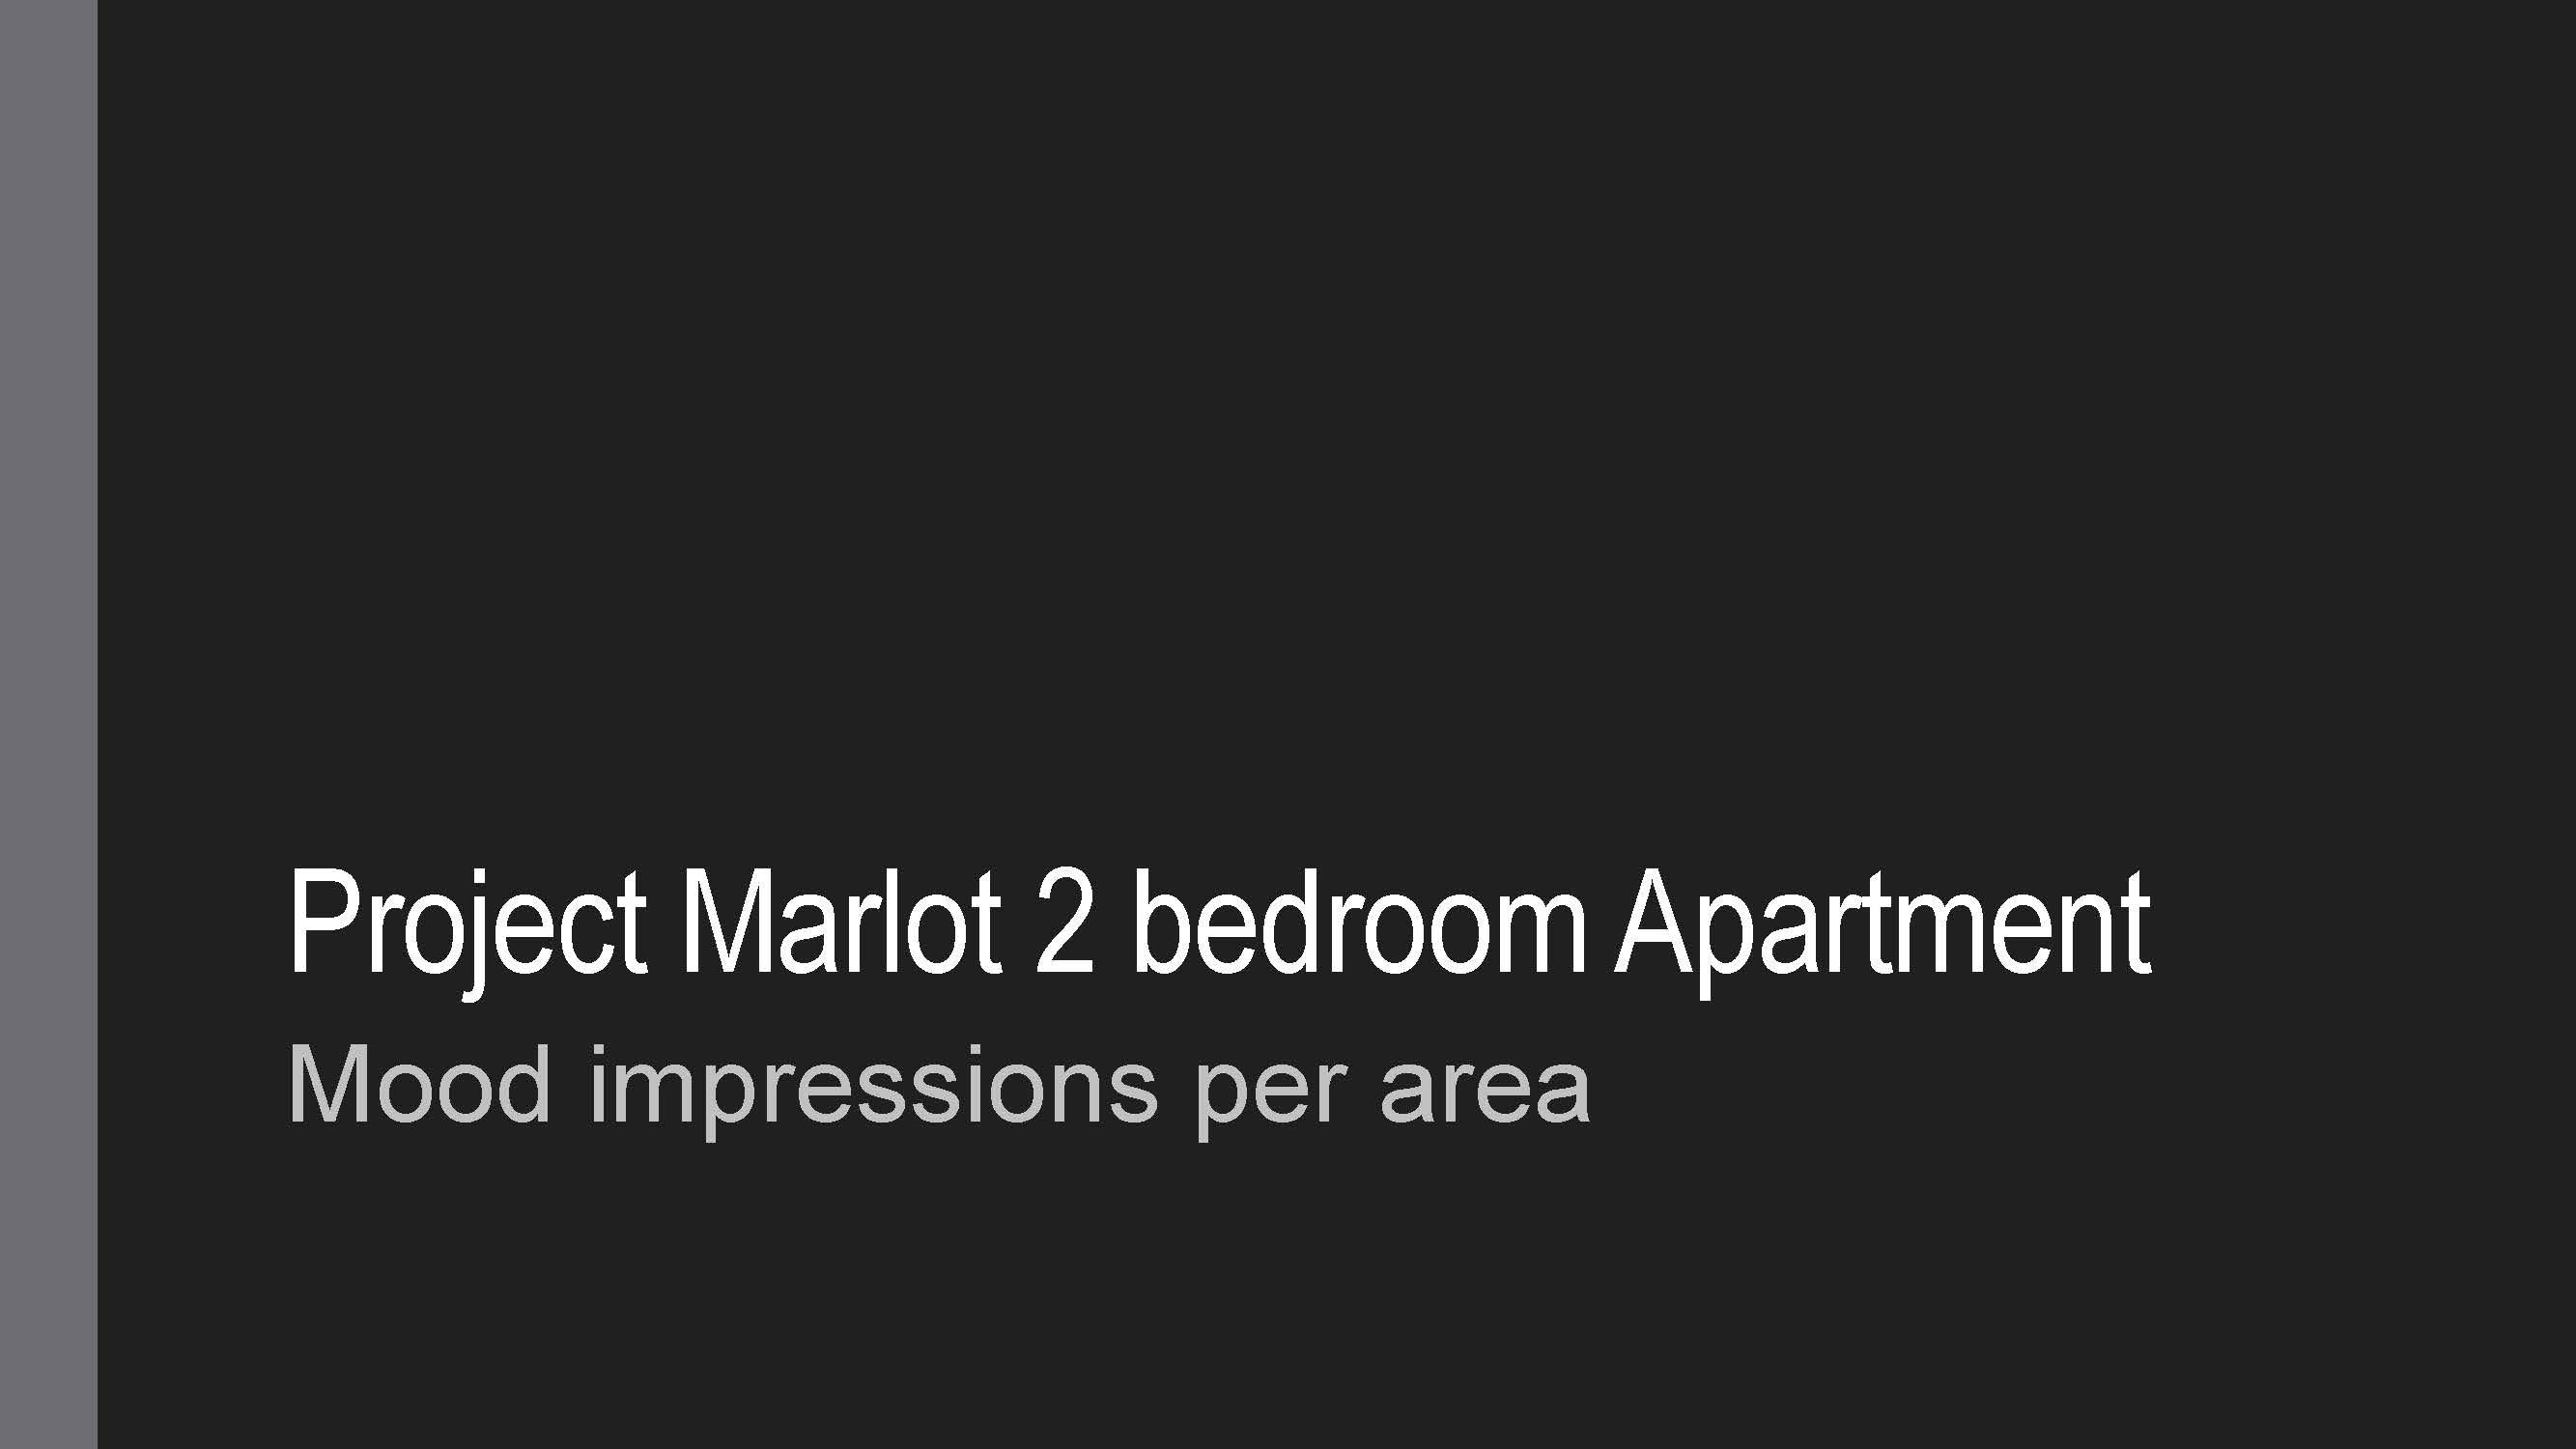 Project Marlot mood impressions v.2 jpg_Pagina_01